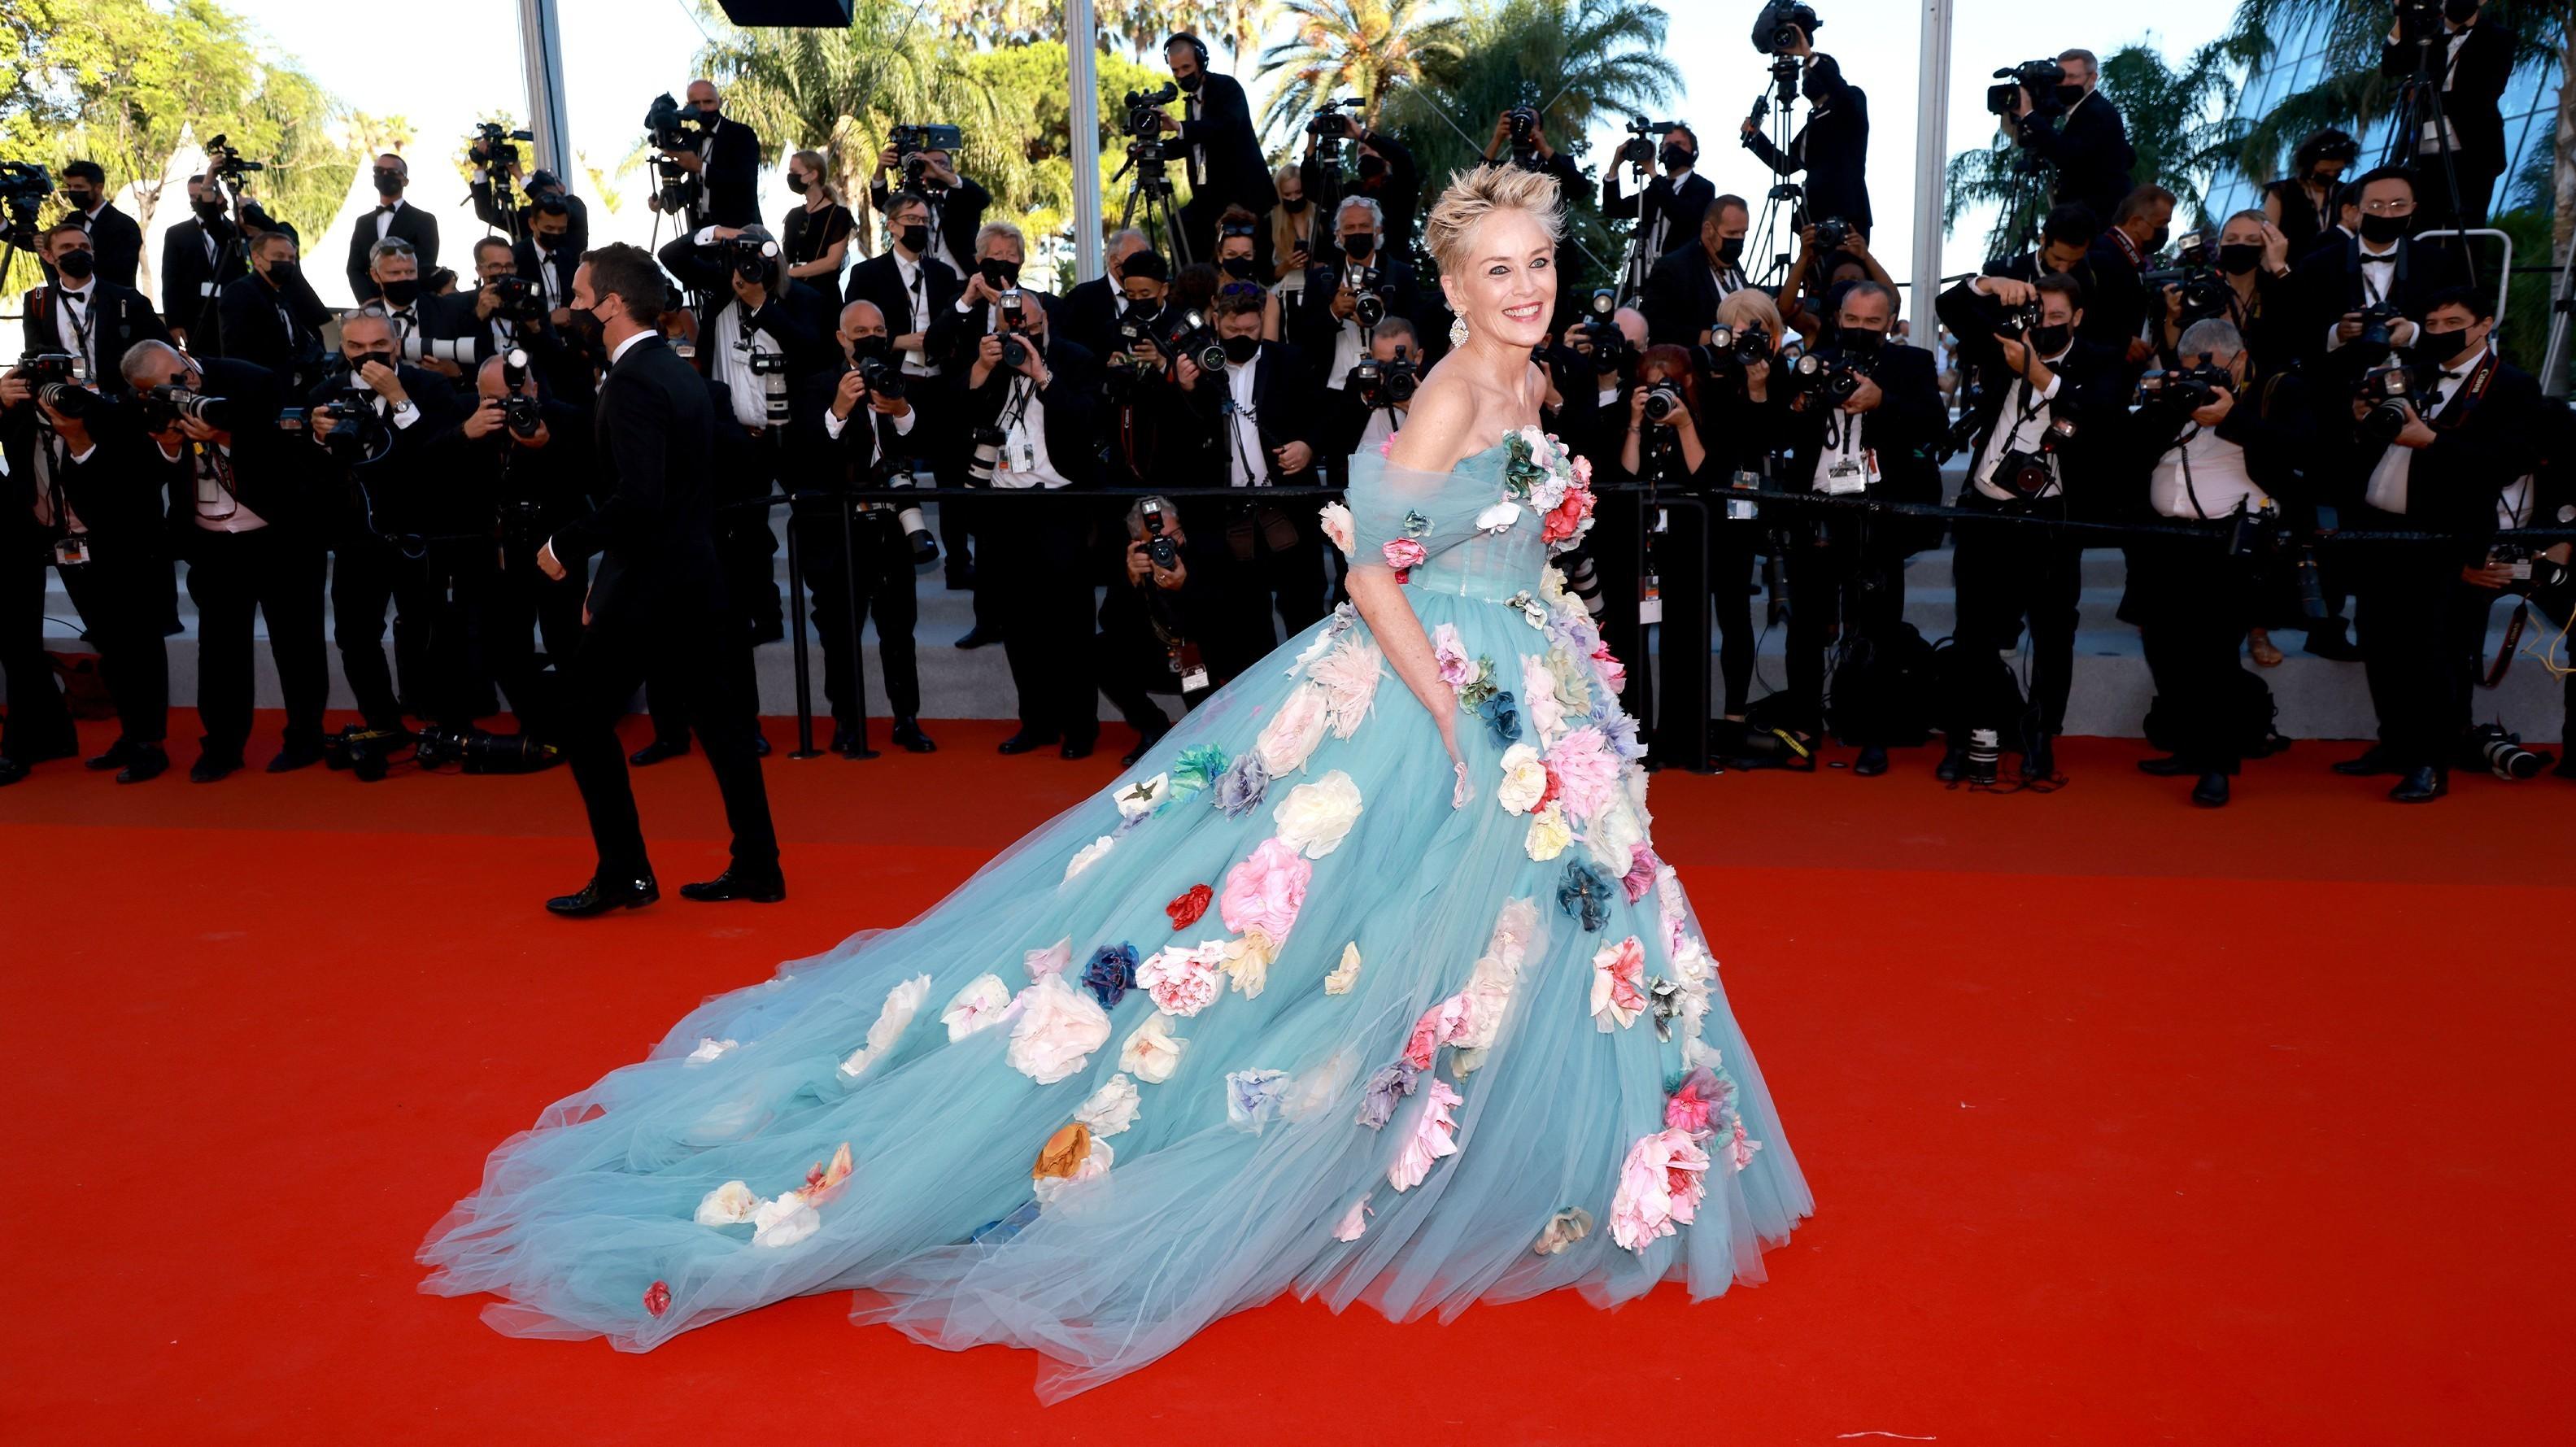 Куда смотрели стилисты? —Фото худших нарядов звезд наКаннском фестивале-2021